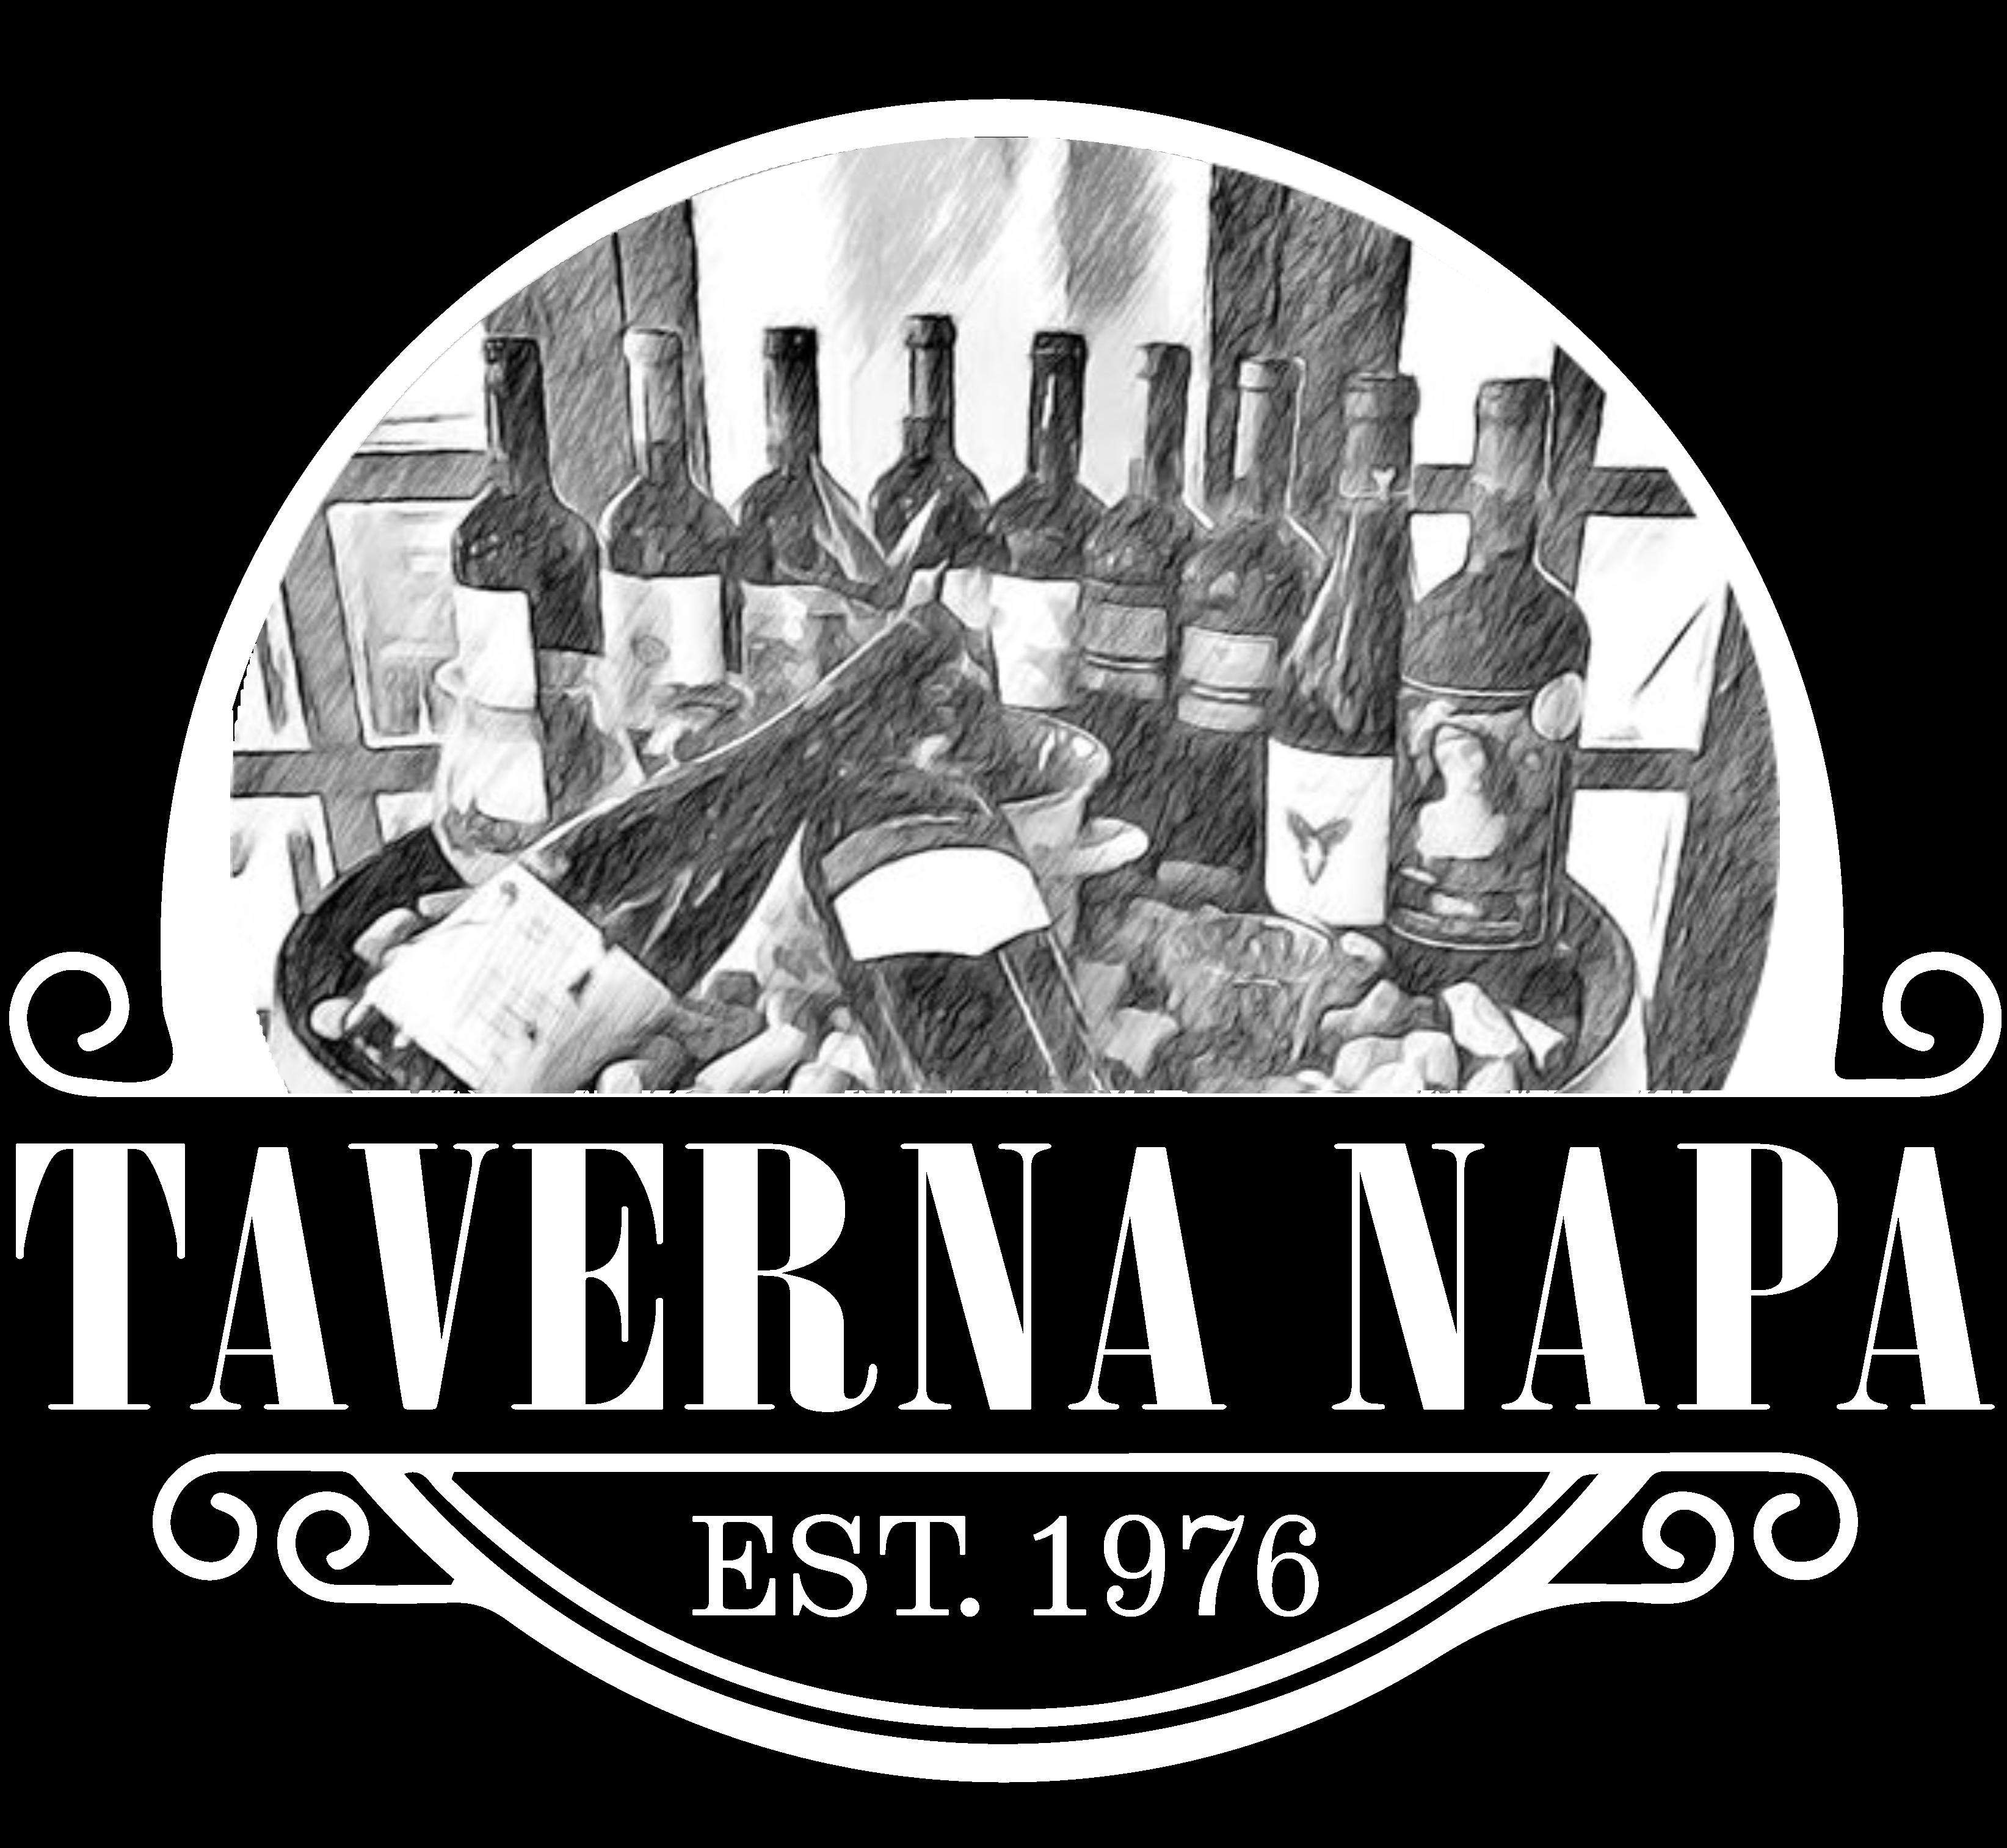 Taverna Napa est.1976